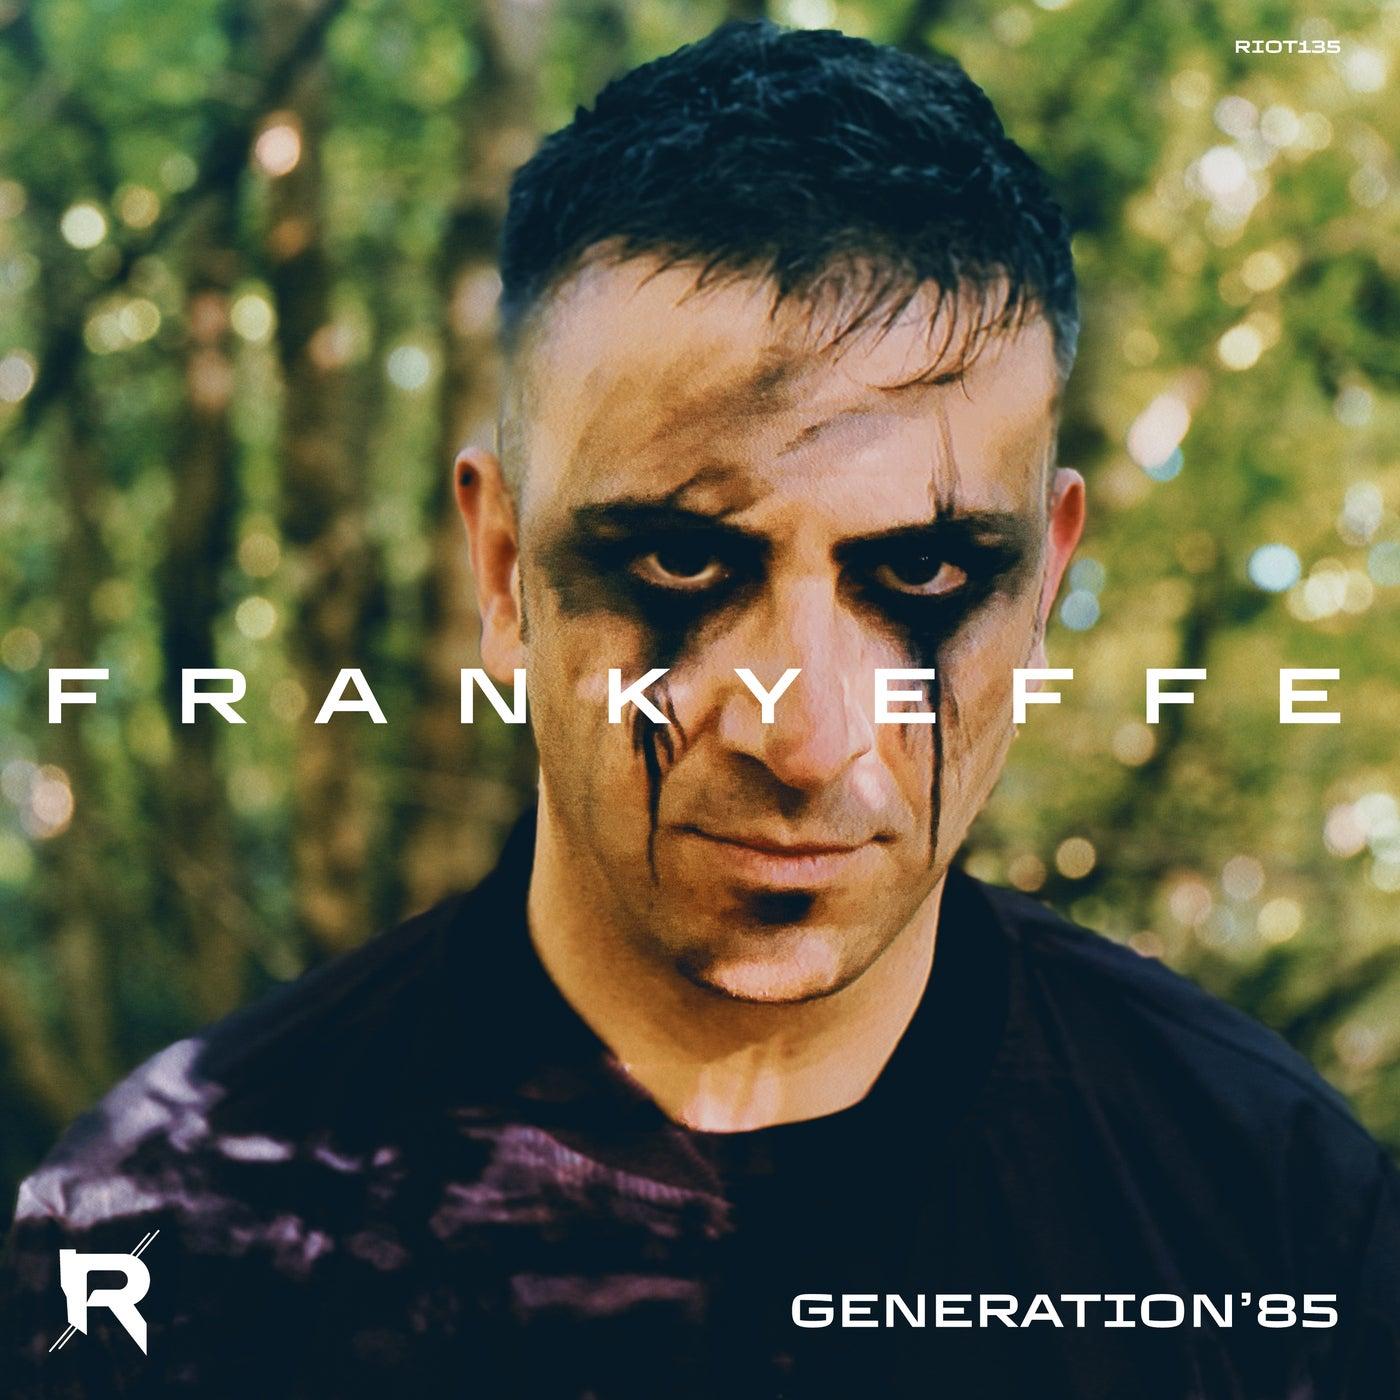 Generation '85 (Original Mix)